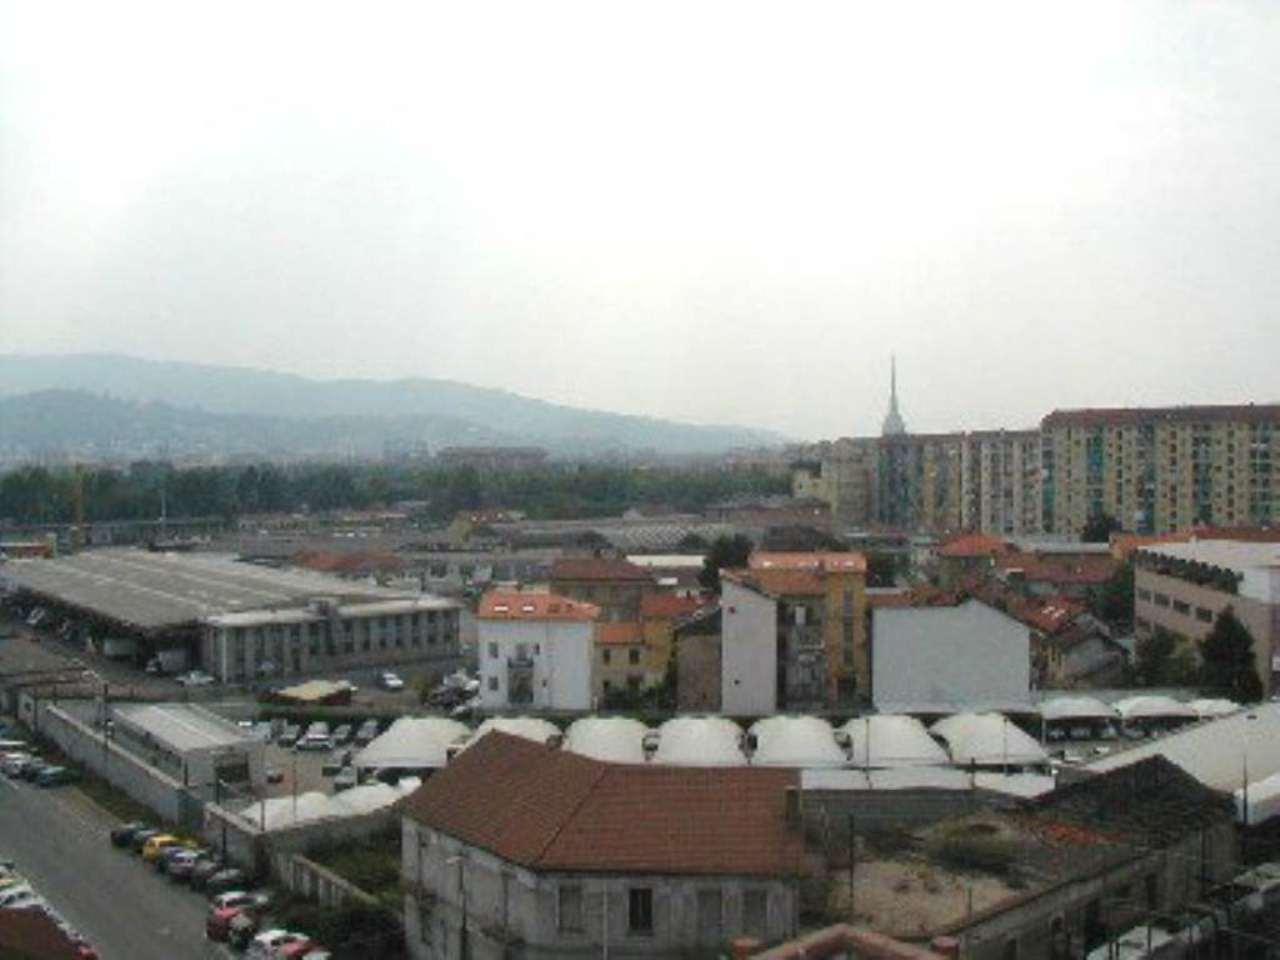 Bilocale Torino Via Pacini 13